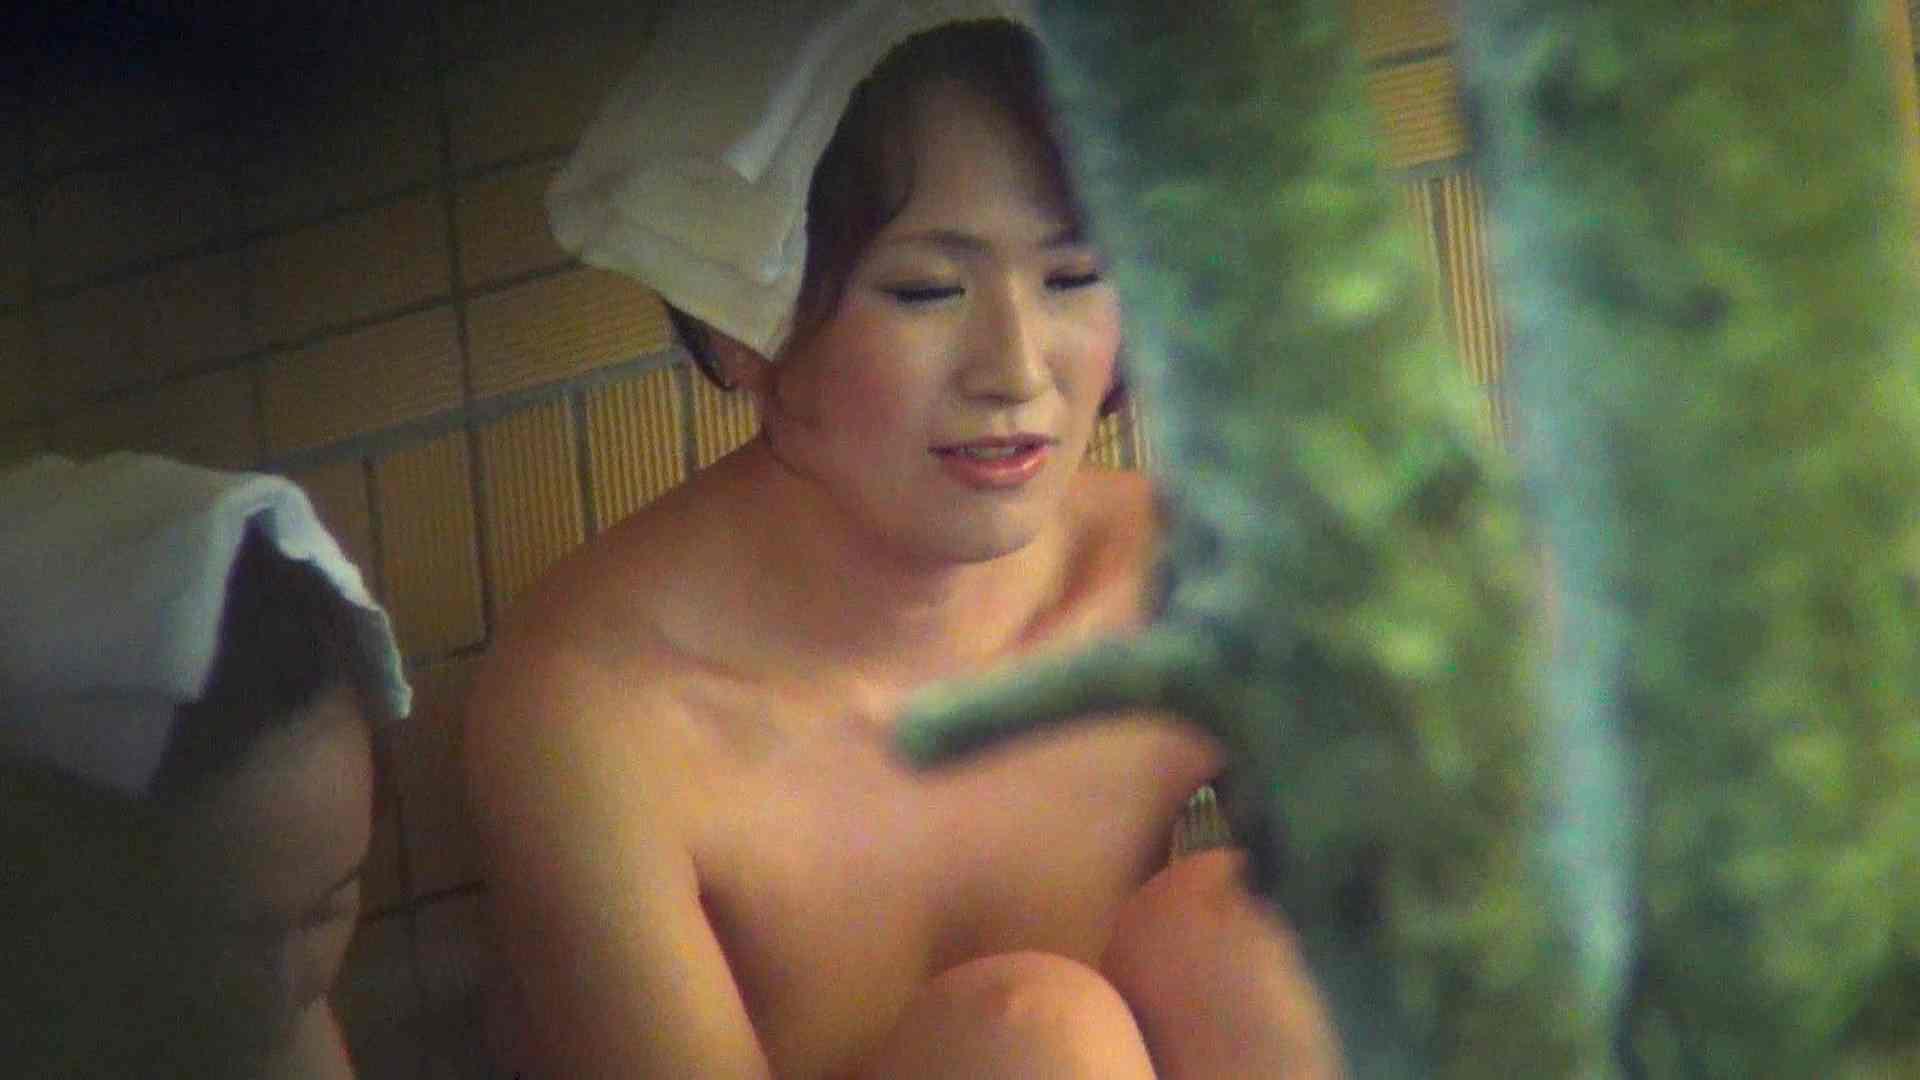 Aquaな露天風呂Vol.272 0  75連発 6